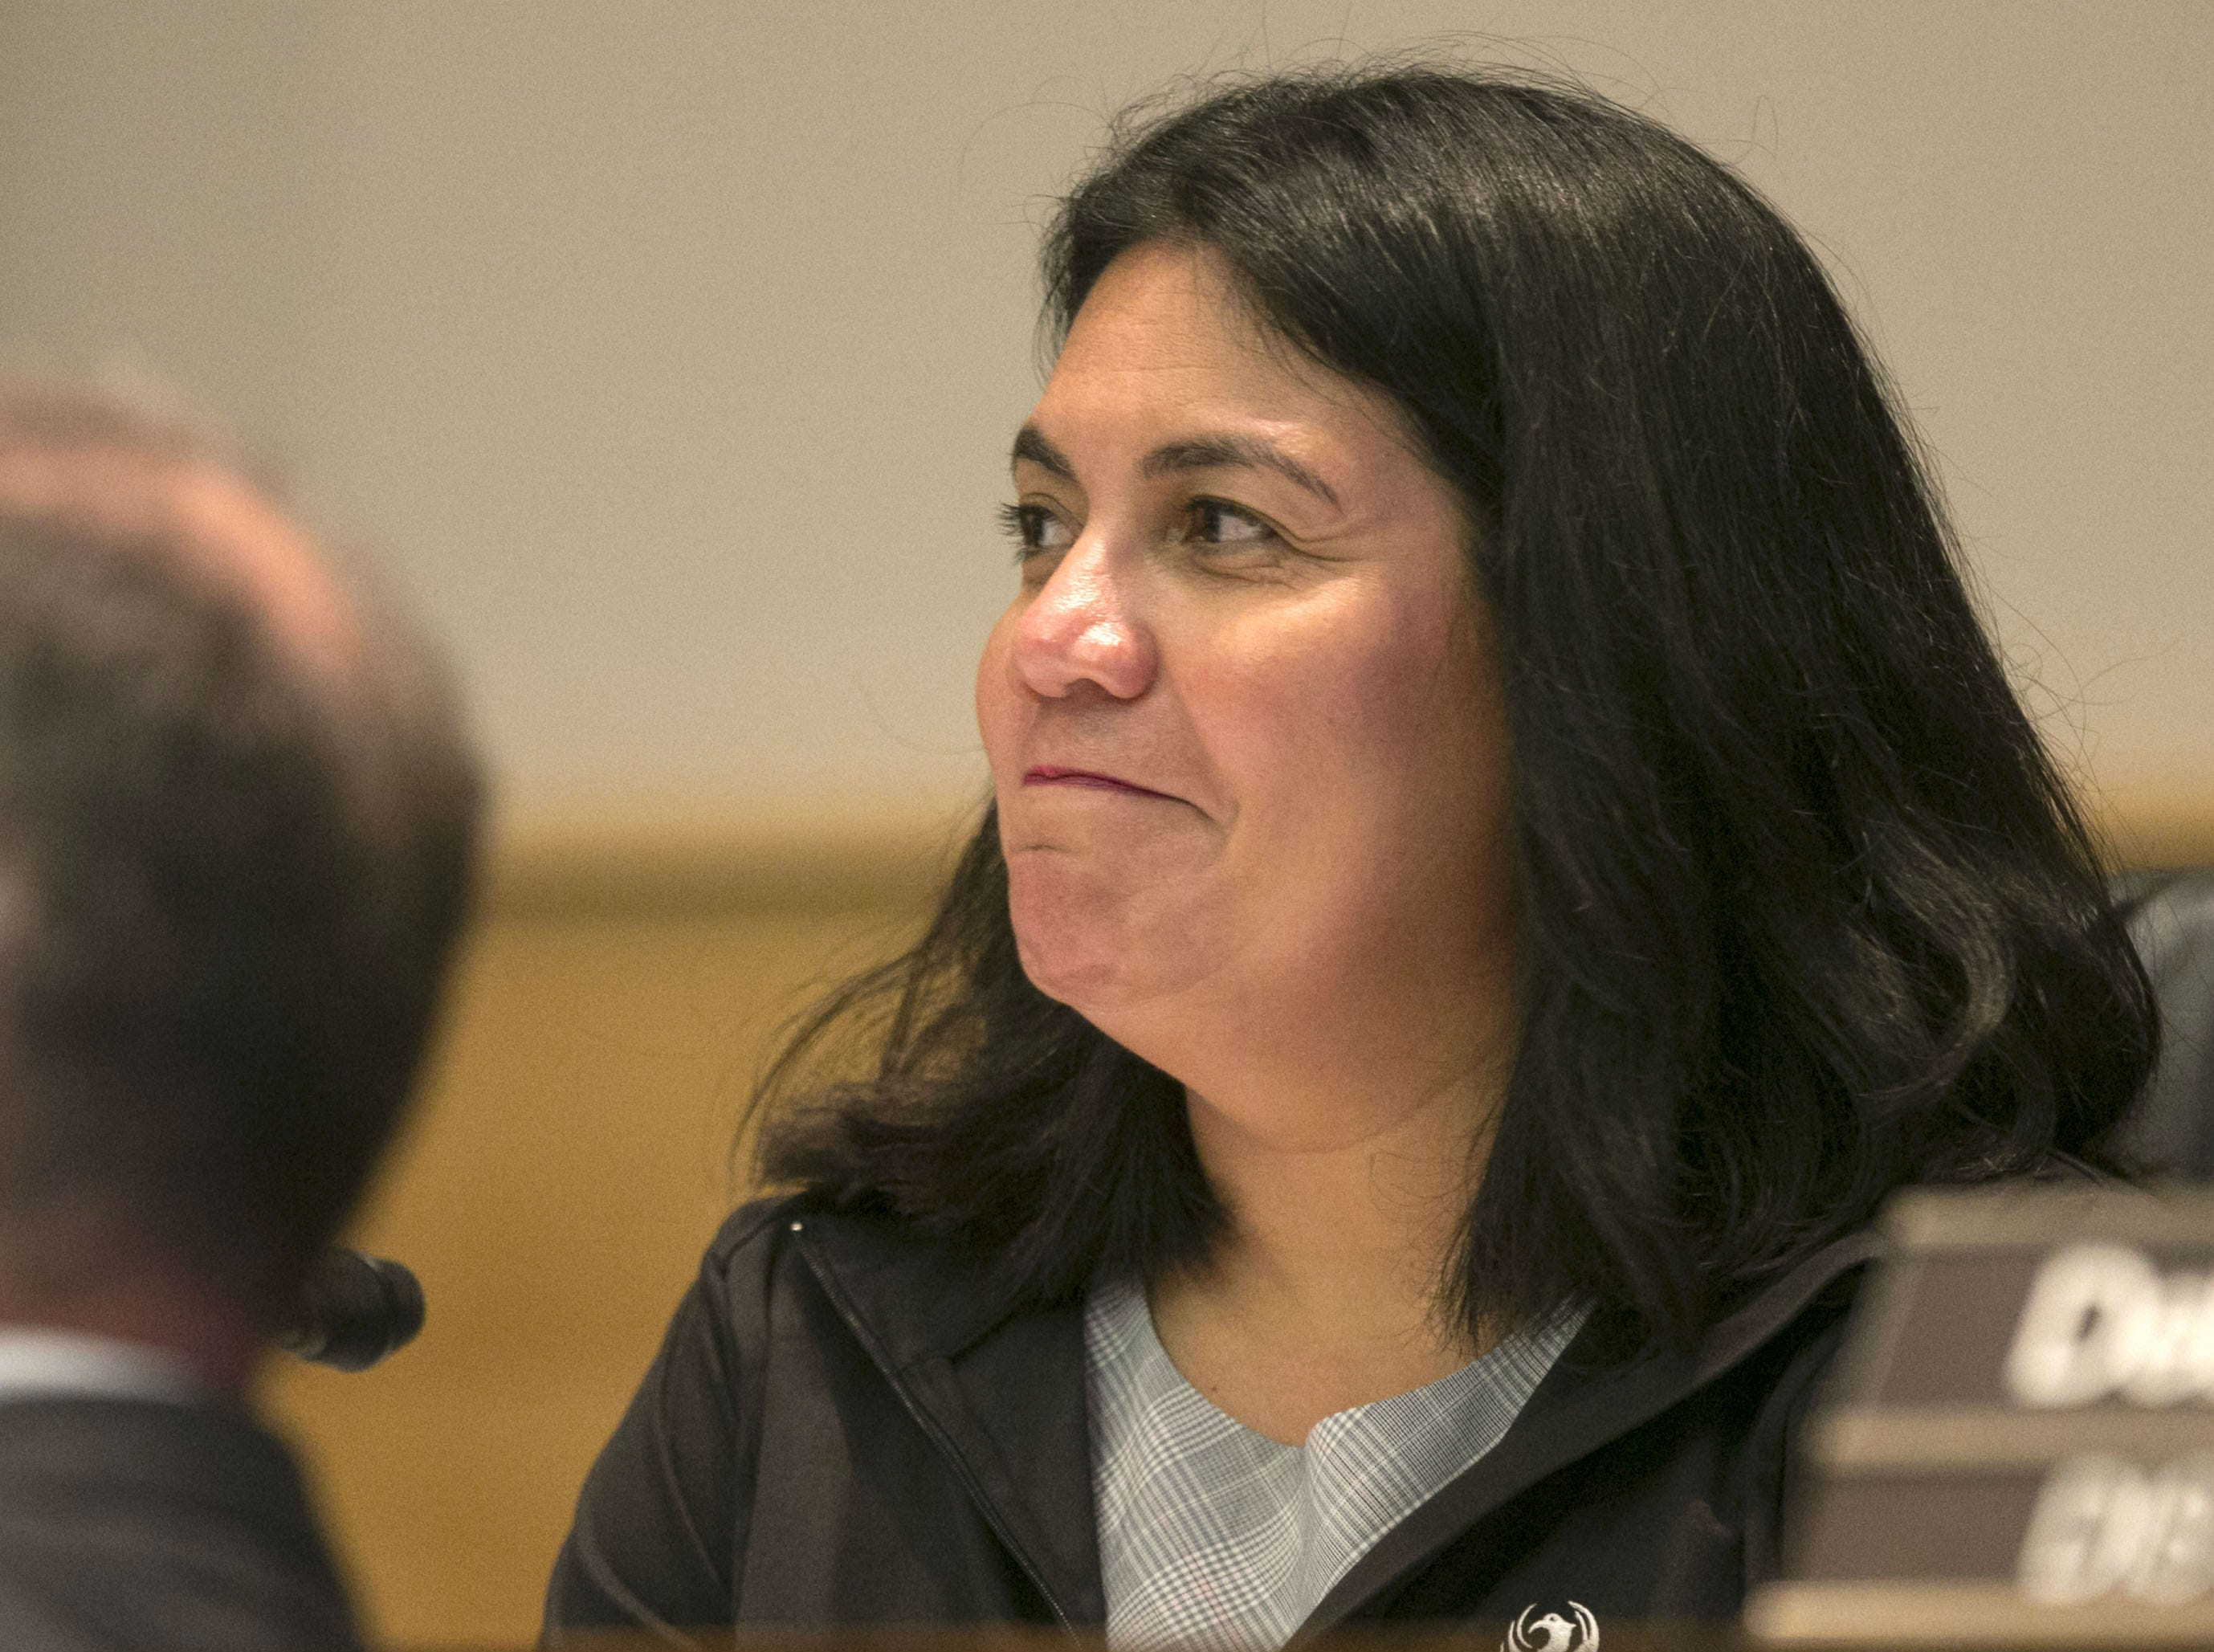 Phoenix City Councilwoman Laura Pastor listens during a Phoenix City Council meeting at the Phoenix City Council Chambers on Sept. 19, 2018.